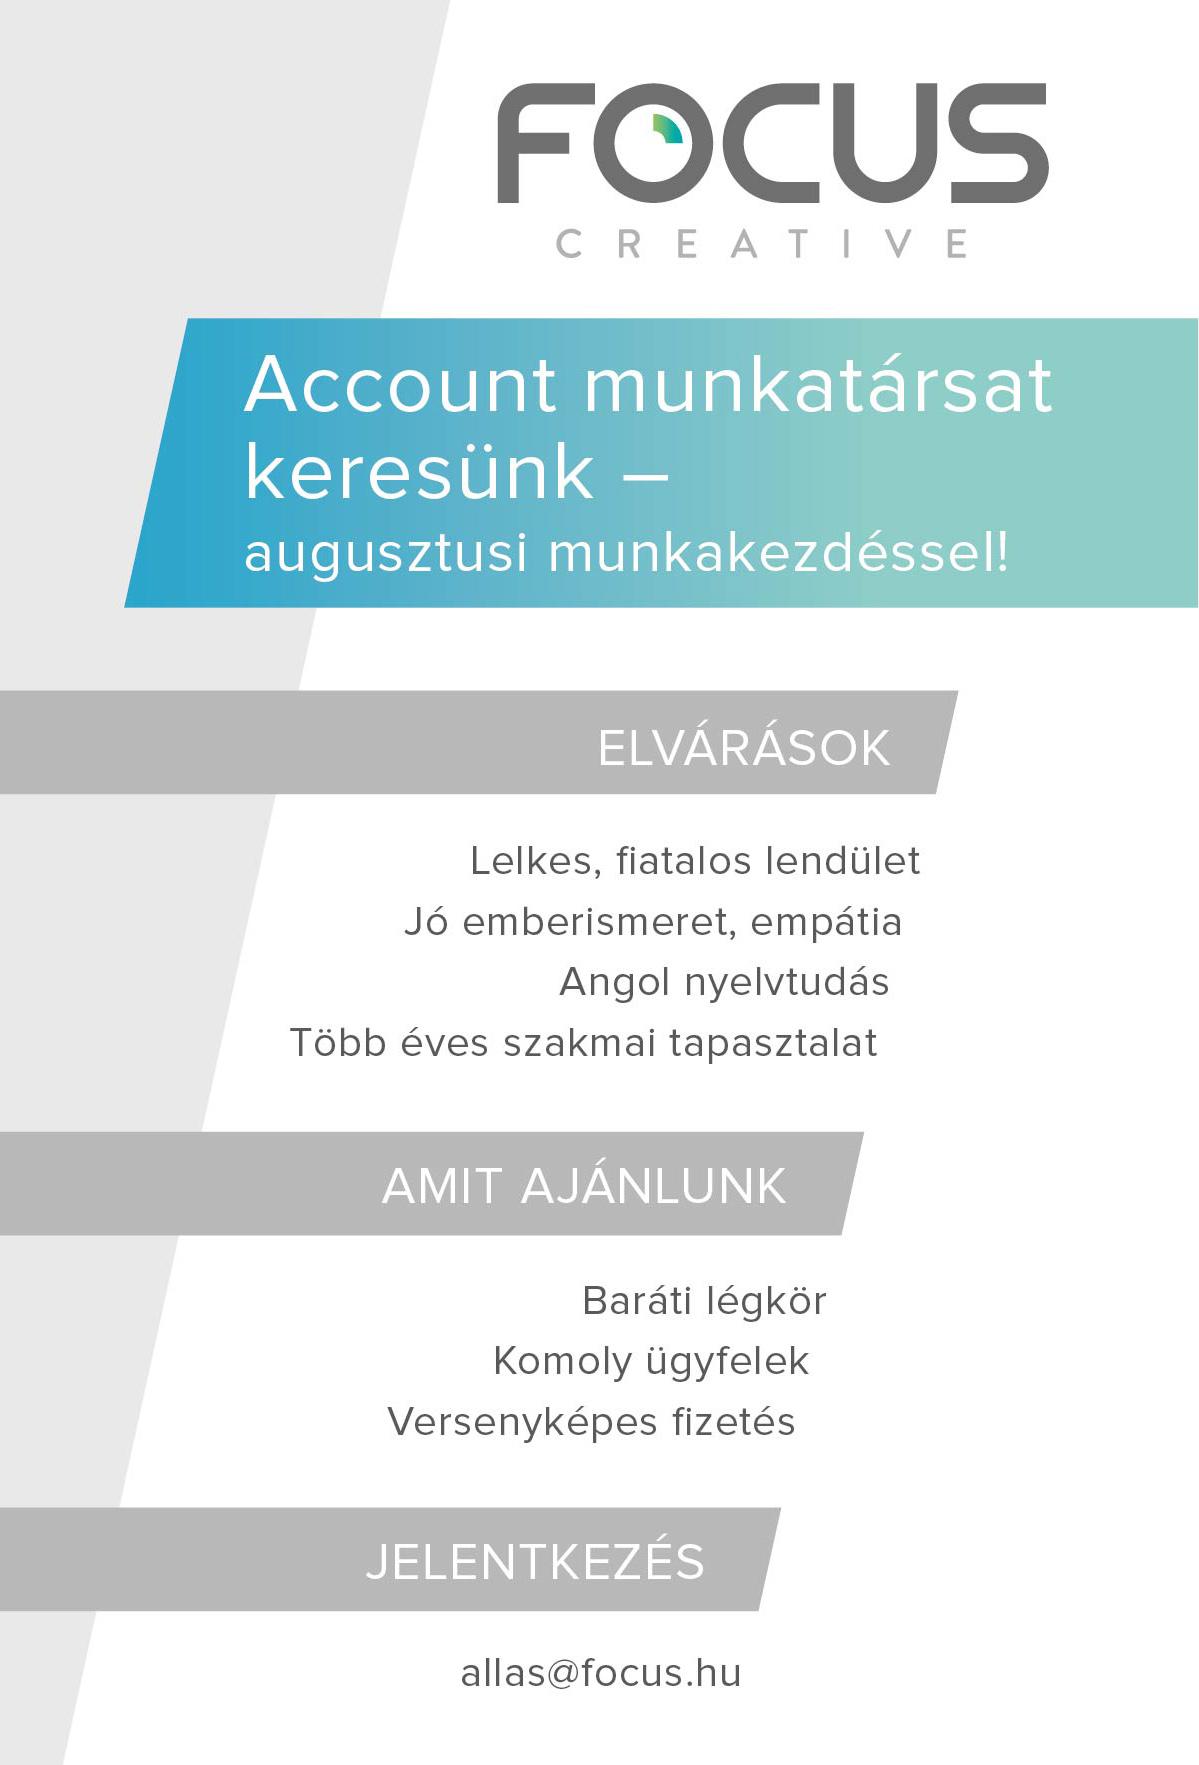 focus_account_hirdetes.jpg